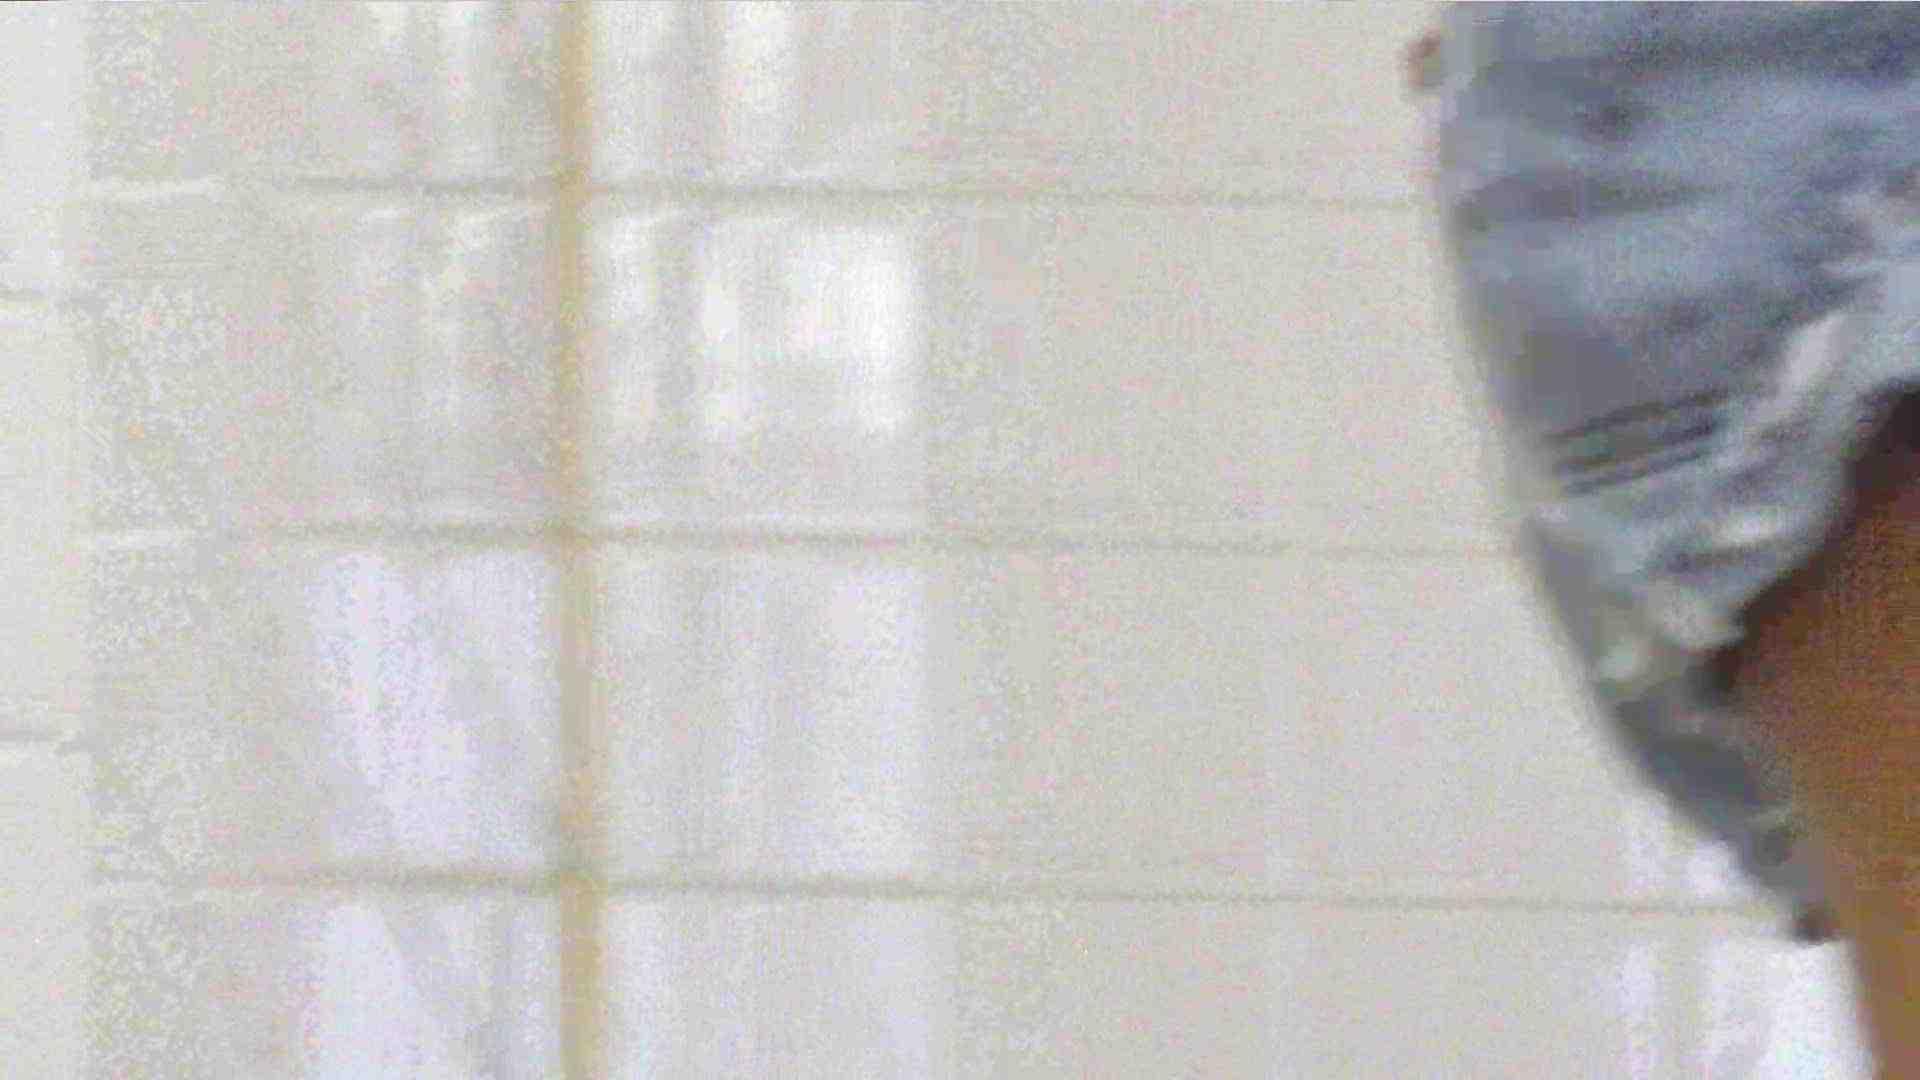 vol.03 命がけ潜伏洗面所! 薄毛がたまりません。 洗面所 盗撮AV動画キャプチャ 74画像 18